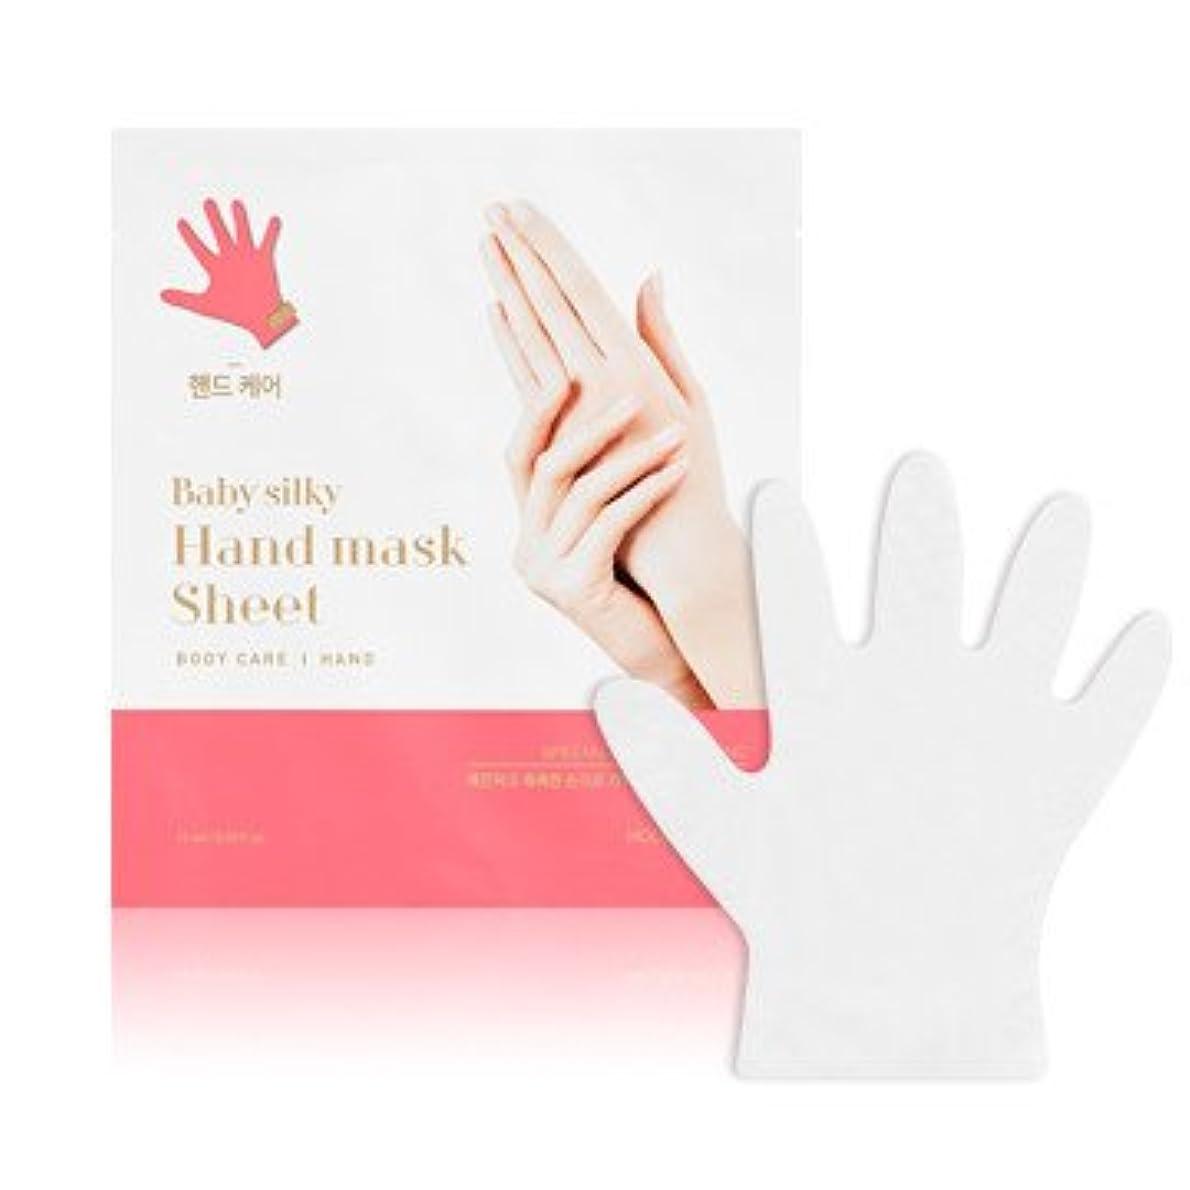 [Holika Holika/ホリカホリカ] ベビーシルキーハンド マスクシート ?しっとり?/ Baby Silky hand Mask Sheet 6EA [並行輸入品]